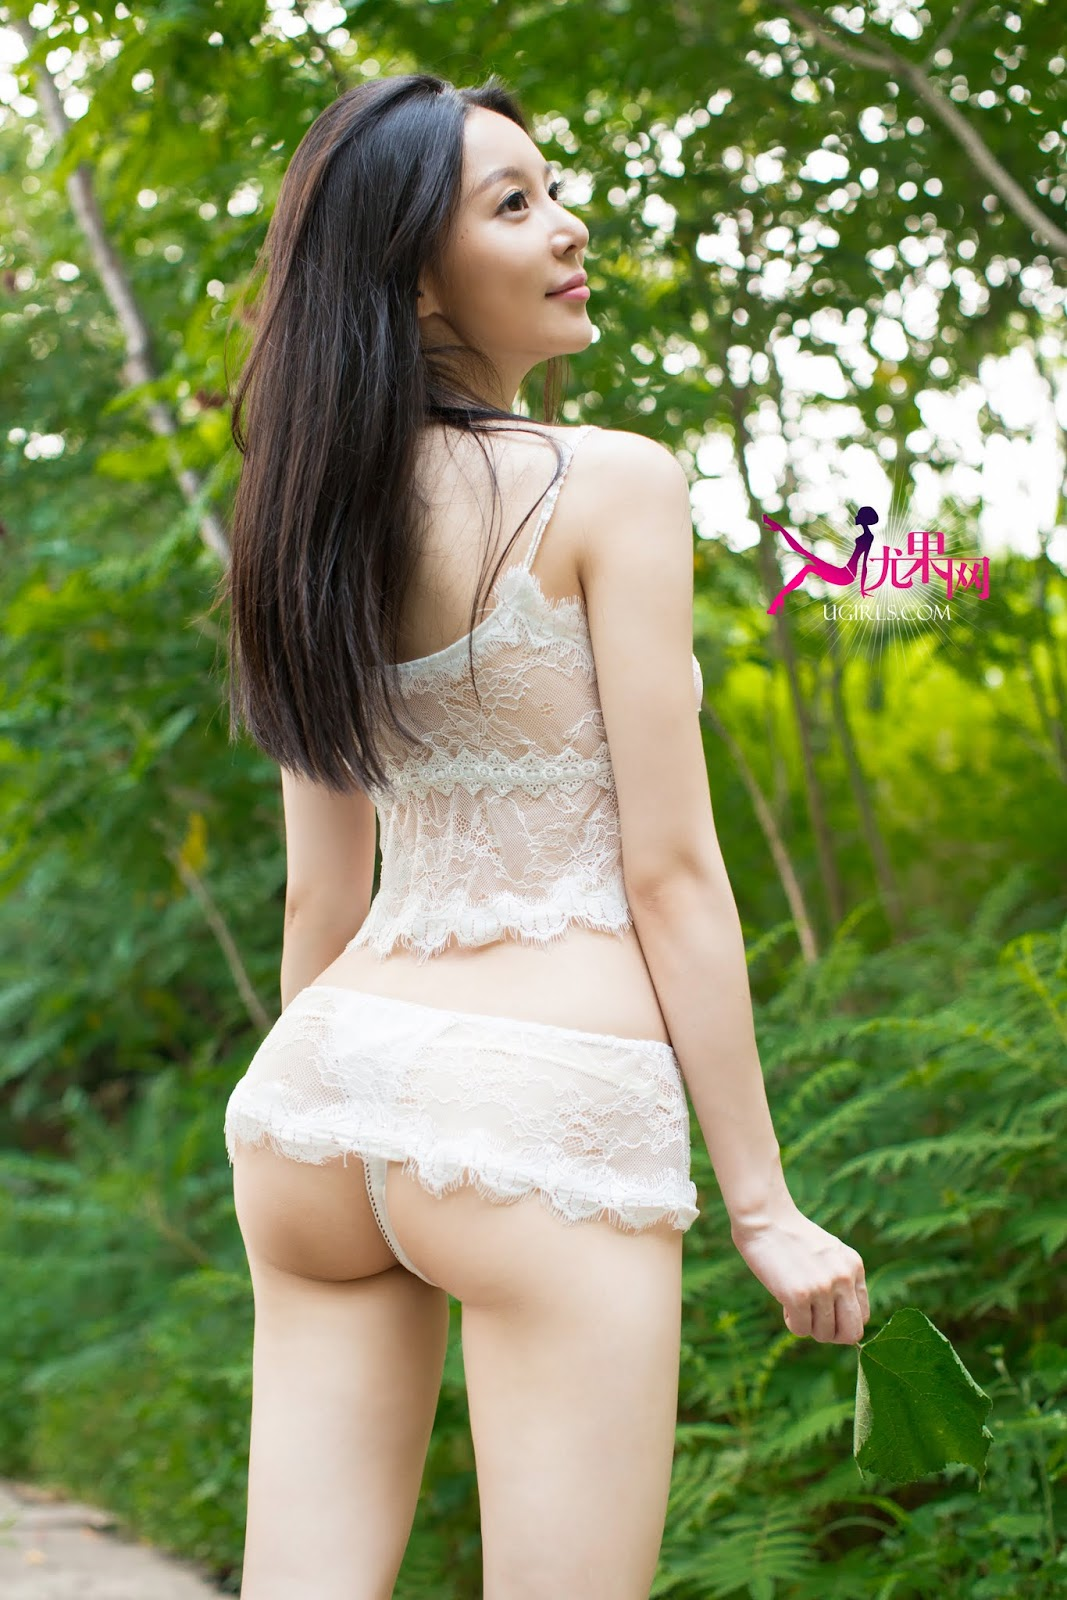 U098%2B%252851%2529 - Sexy Photo UGIRLS NO.98 Nude Girl